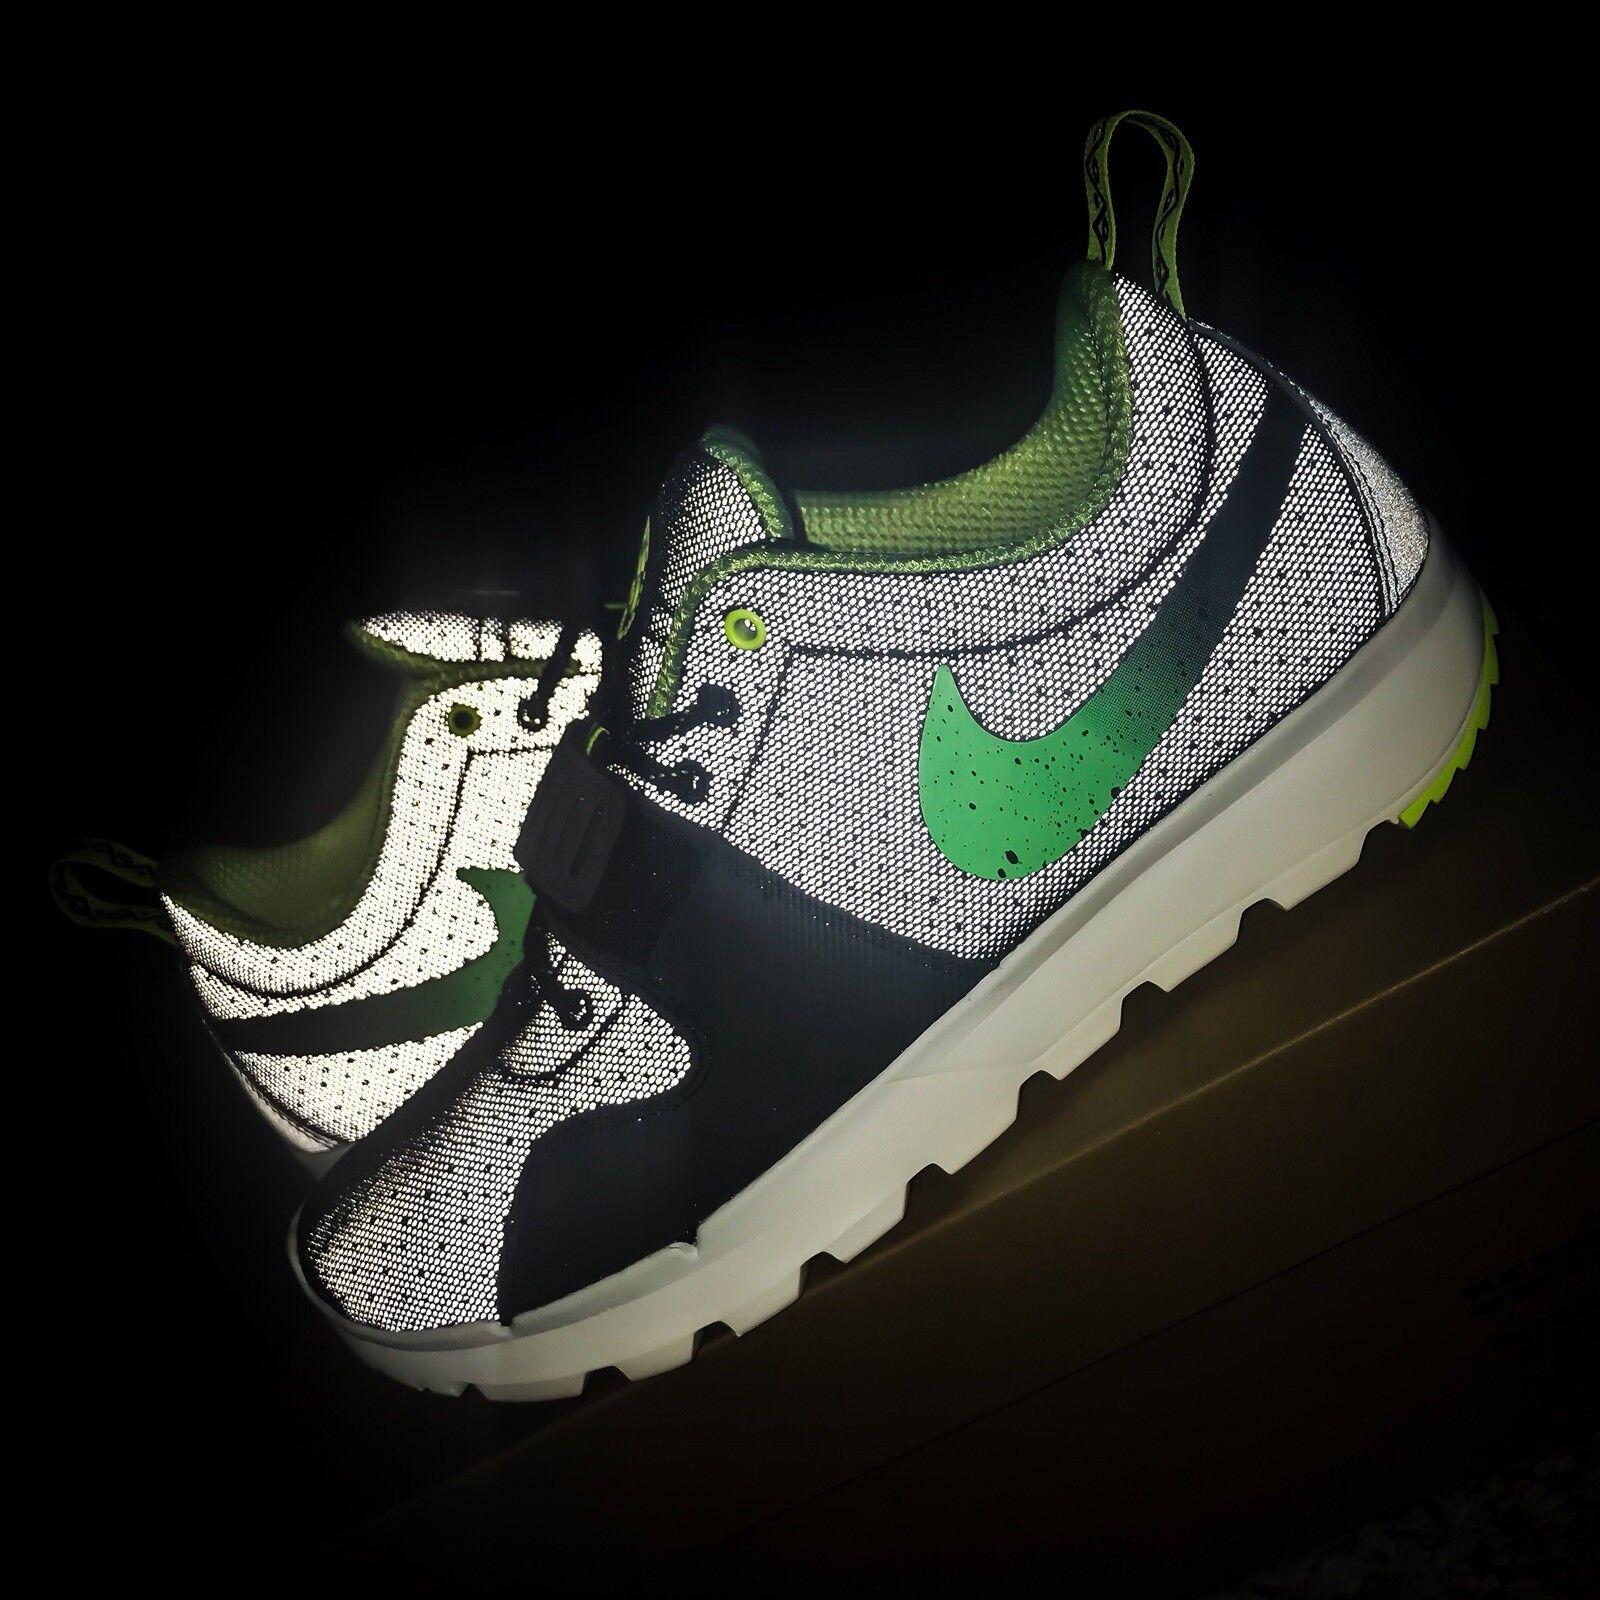 Nike stussy trainerendor 3m acg pack sz super limitata volt sacco